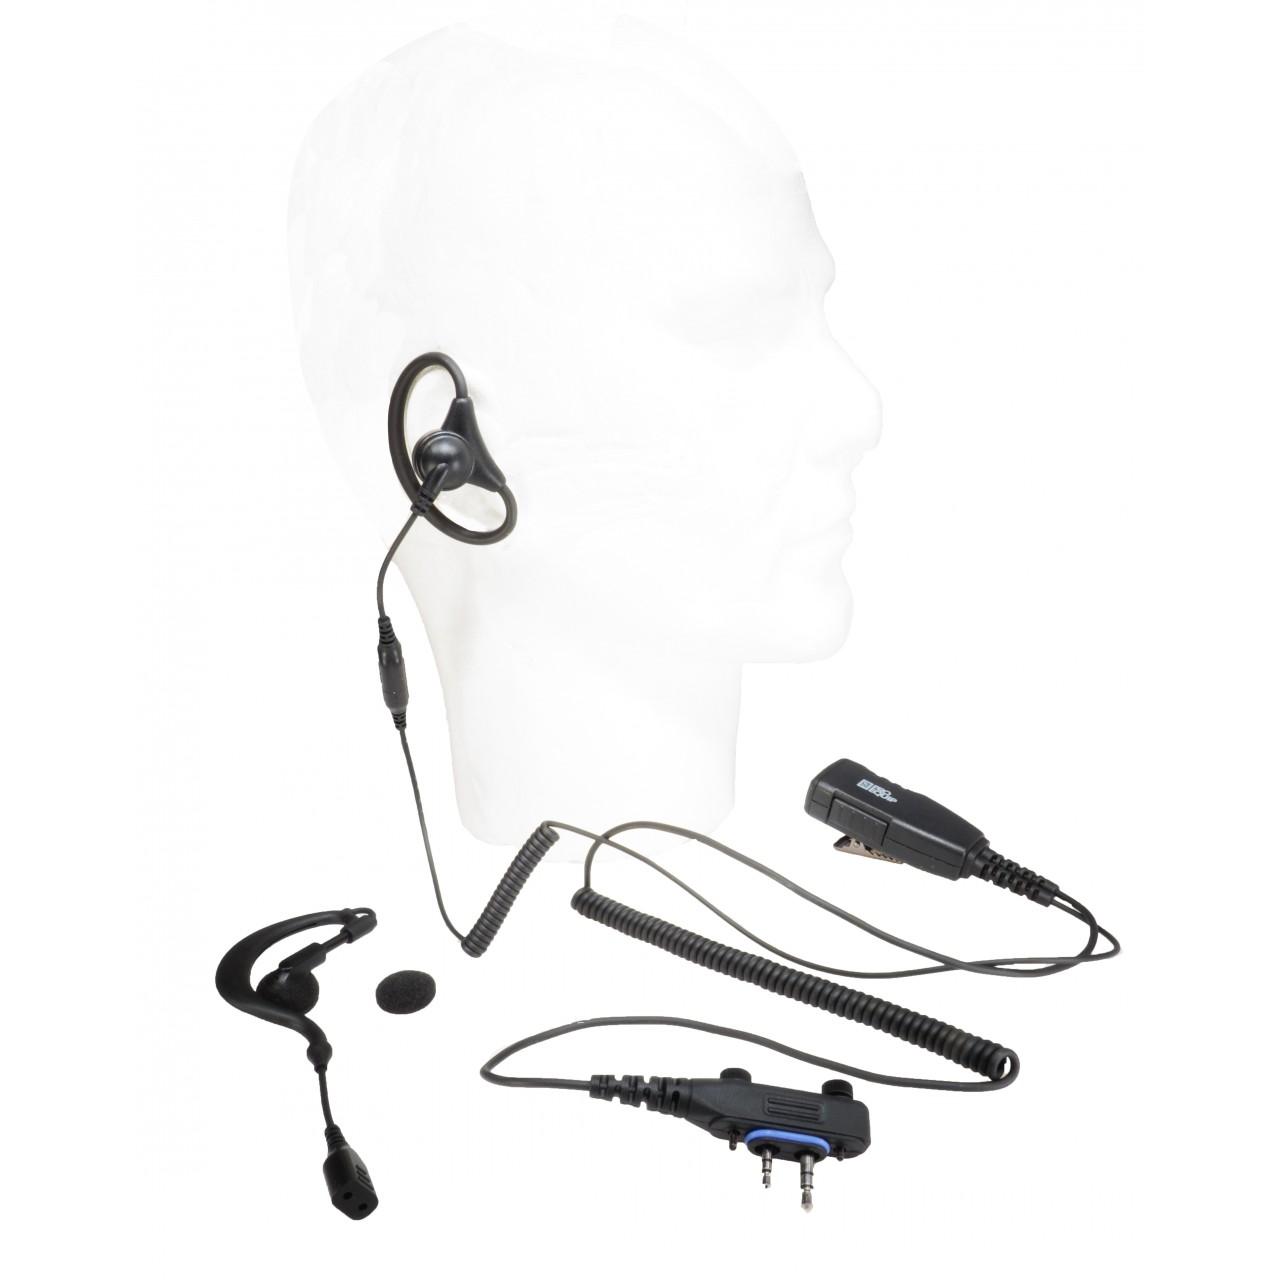 EP-SR29134 Headsets and earphones - ICOM